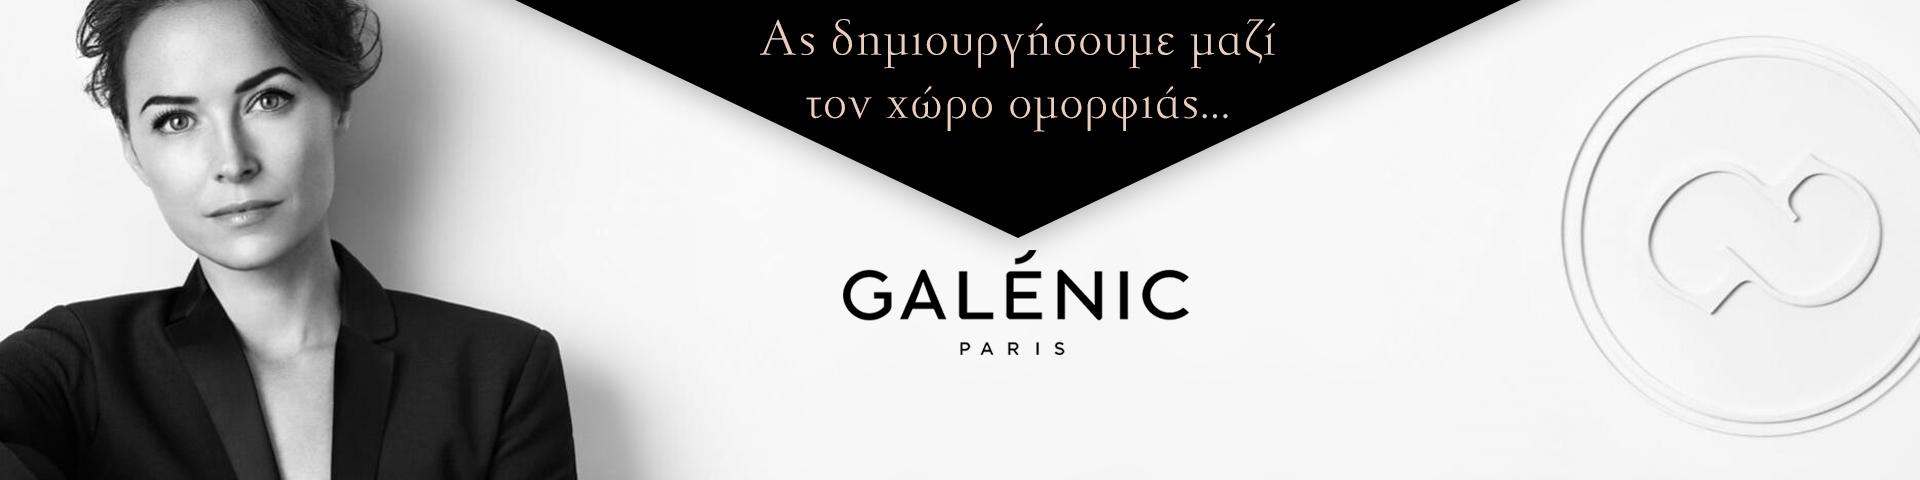 Galenic landing banner feb20 1920x480